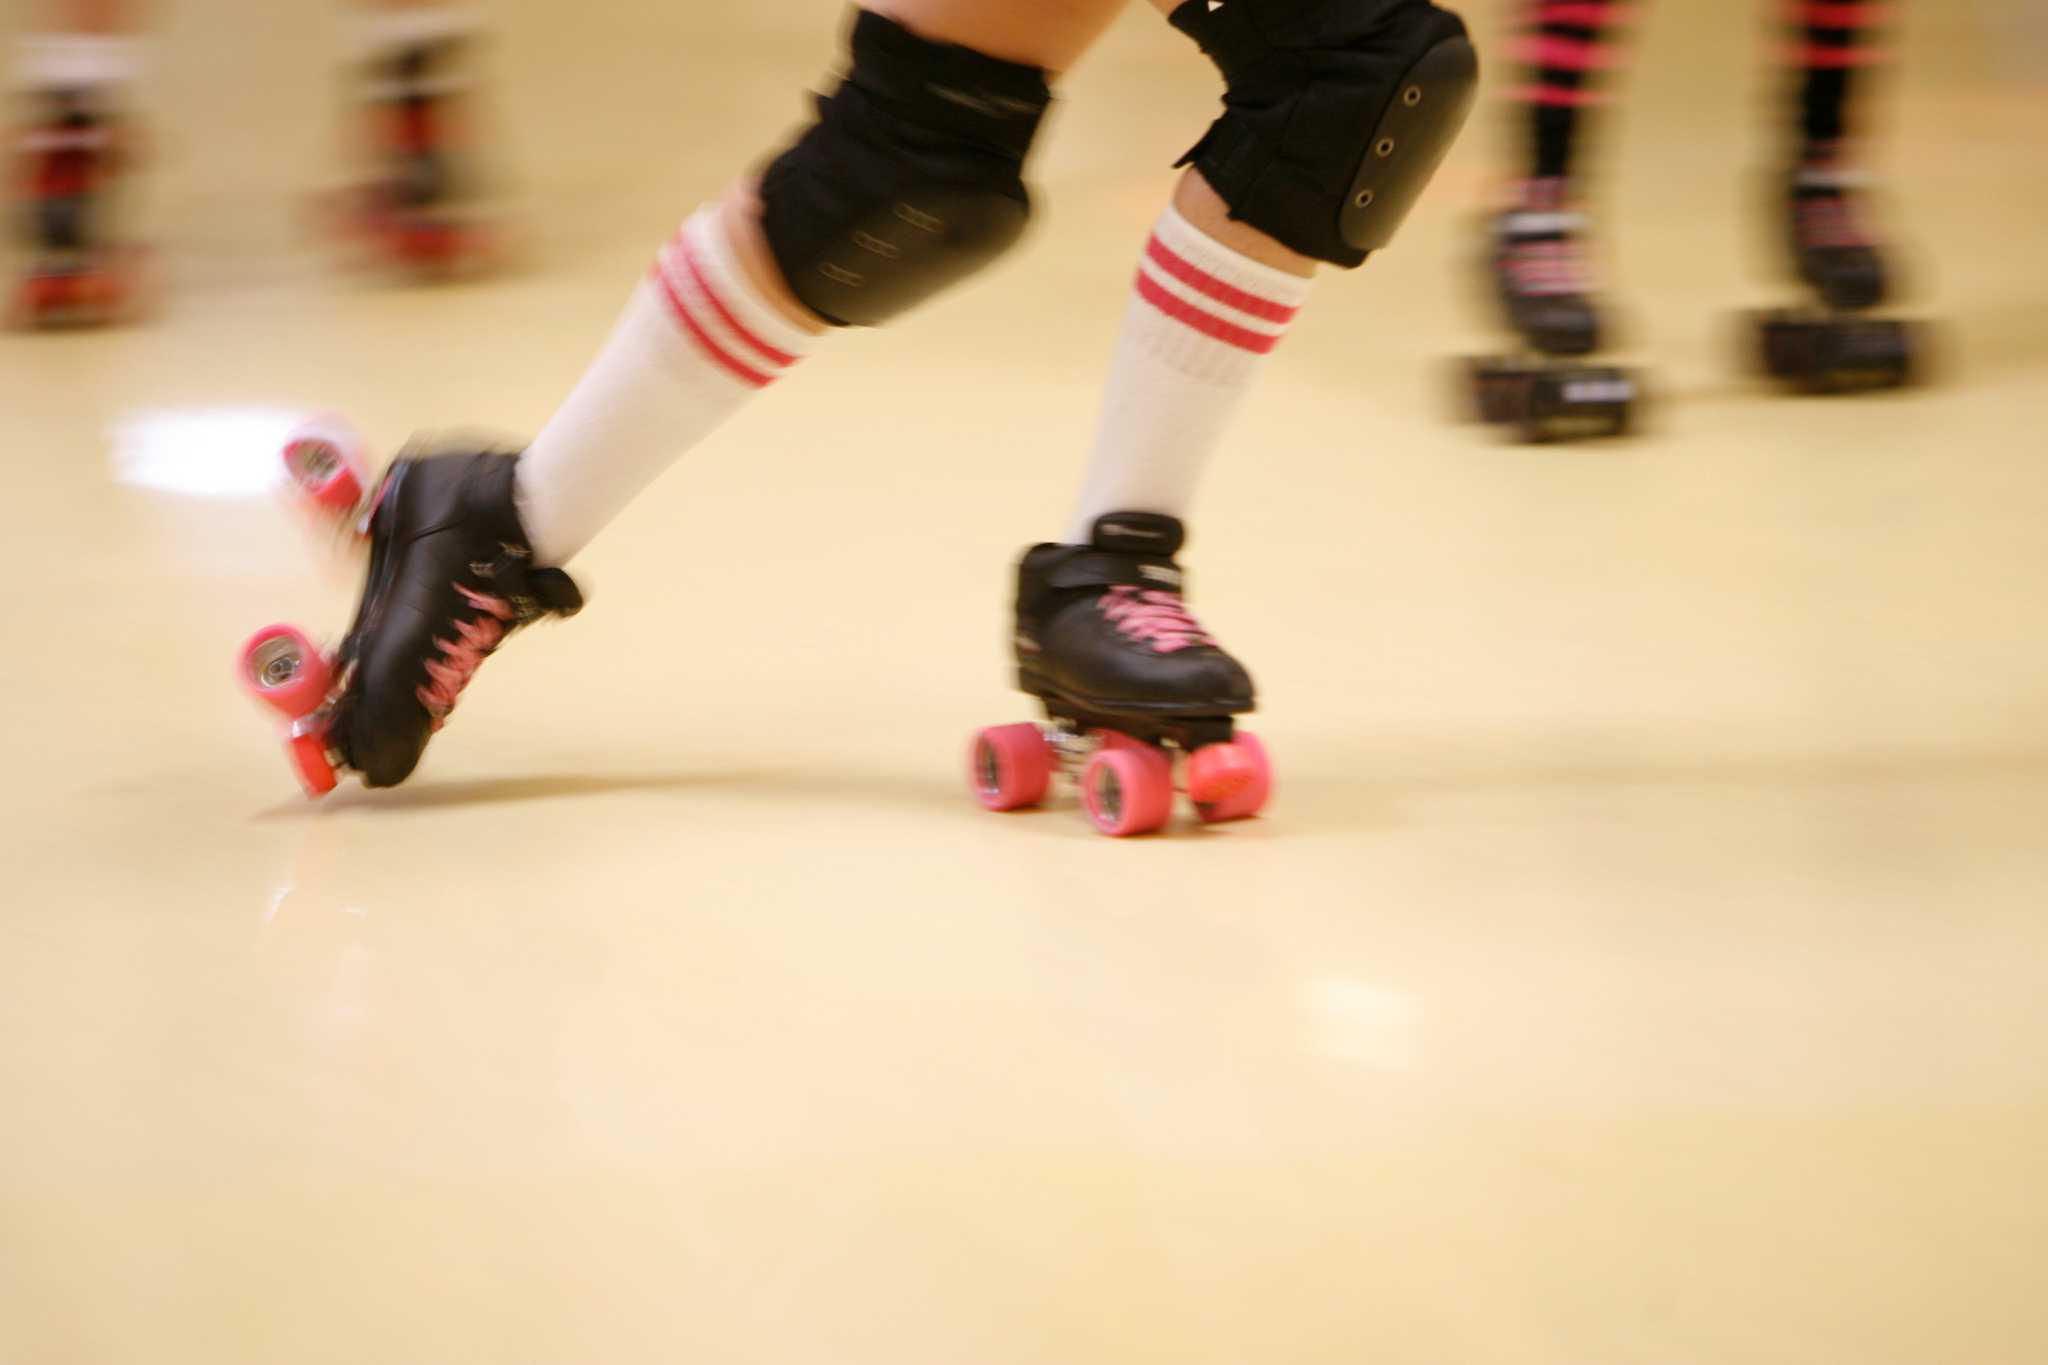 Roller skating rink music - Roller Skating Rink Music 56